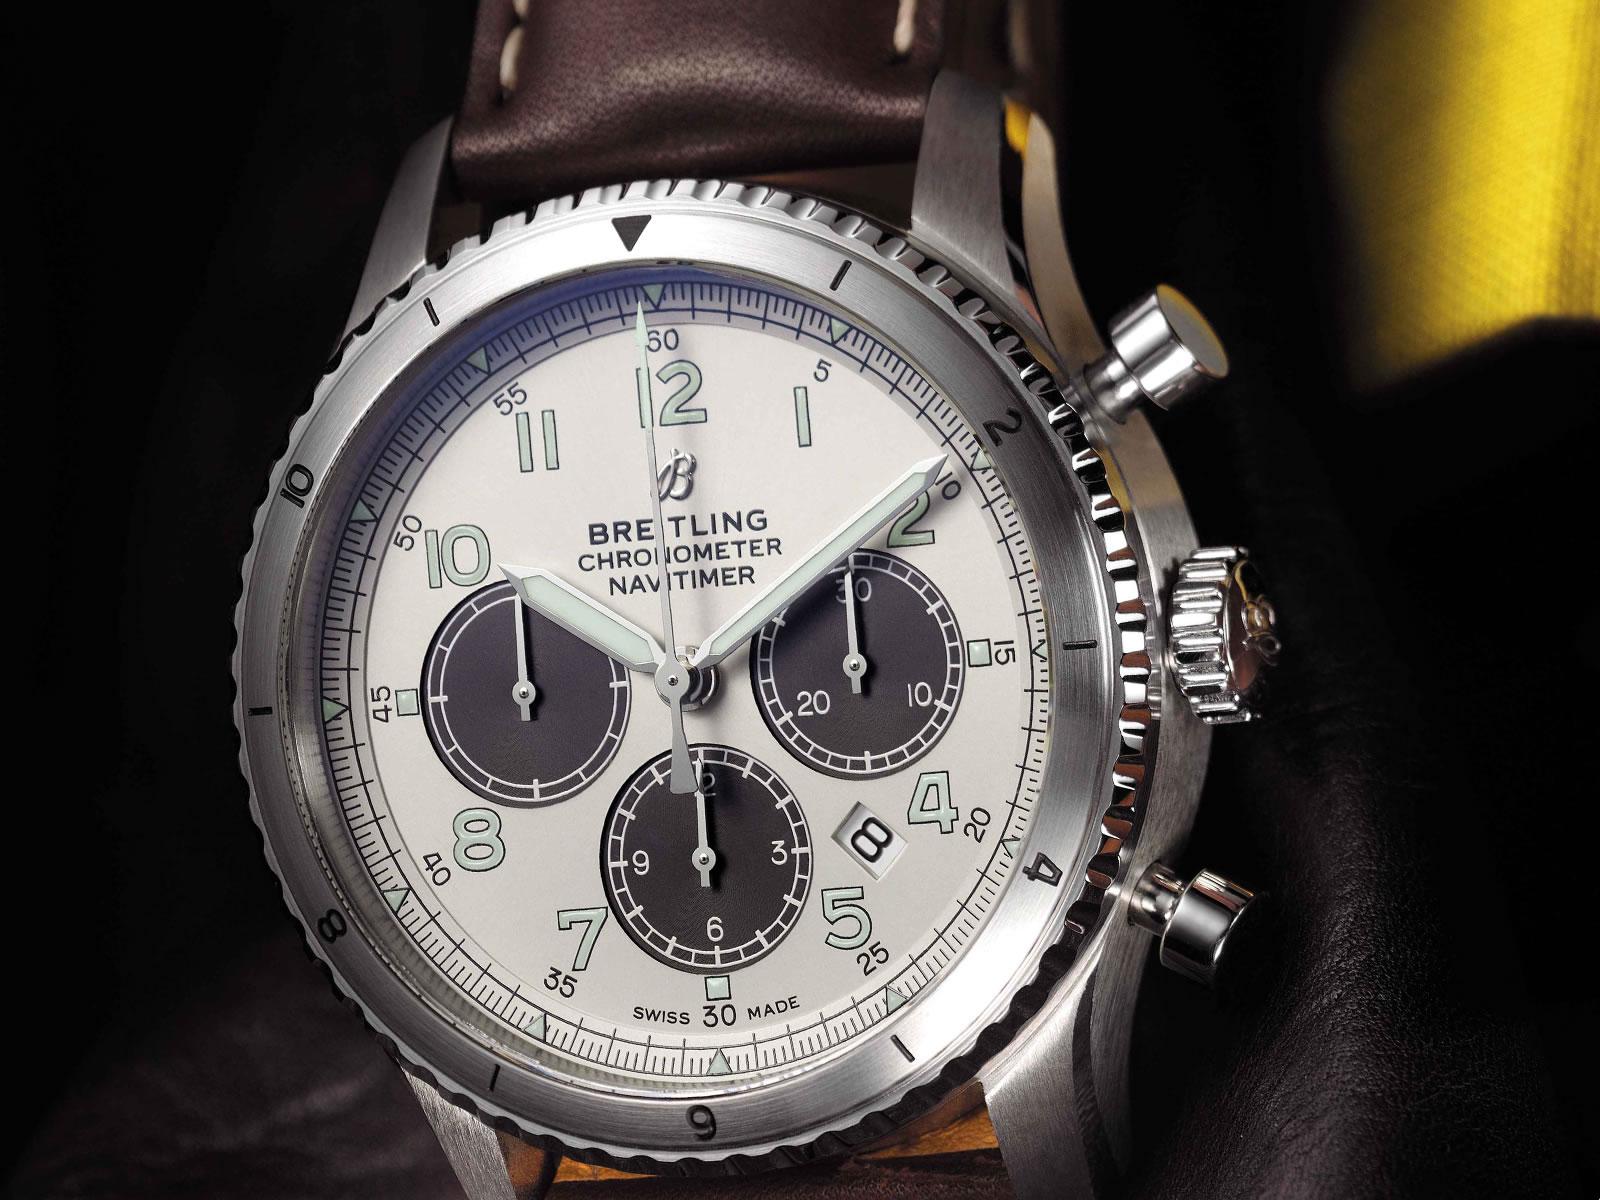 ab01171a-g839-breitling-navitimer-aviator-8-b01-the-chronograph-43-9.jpg